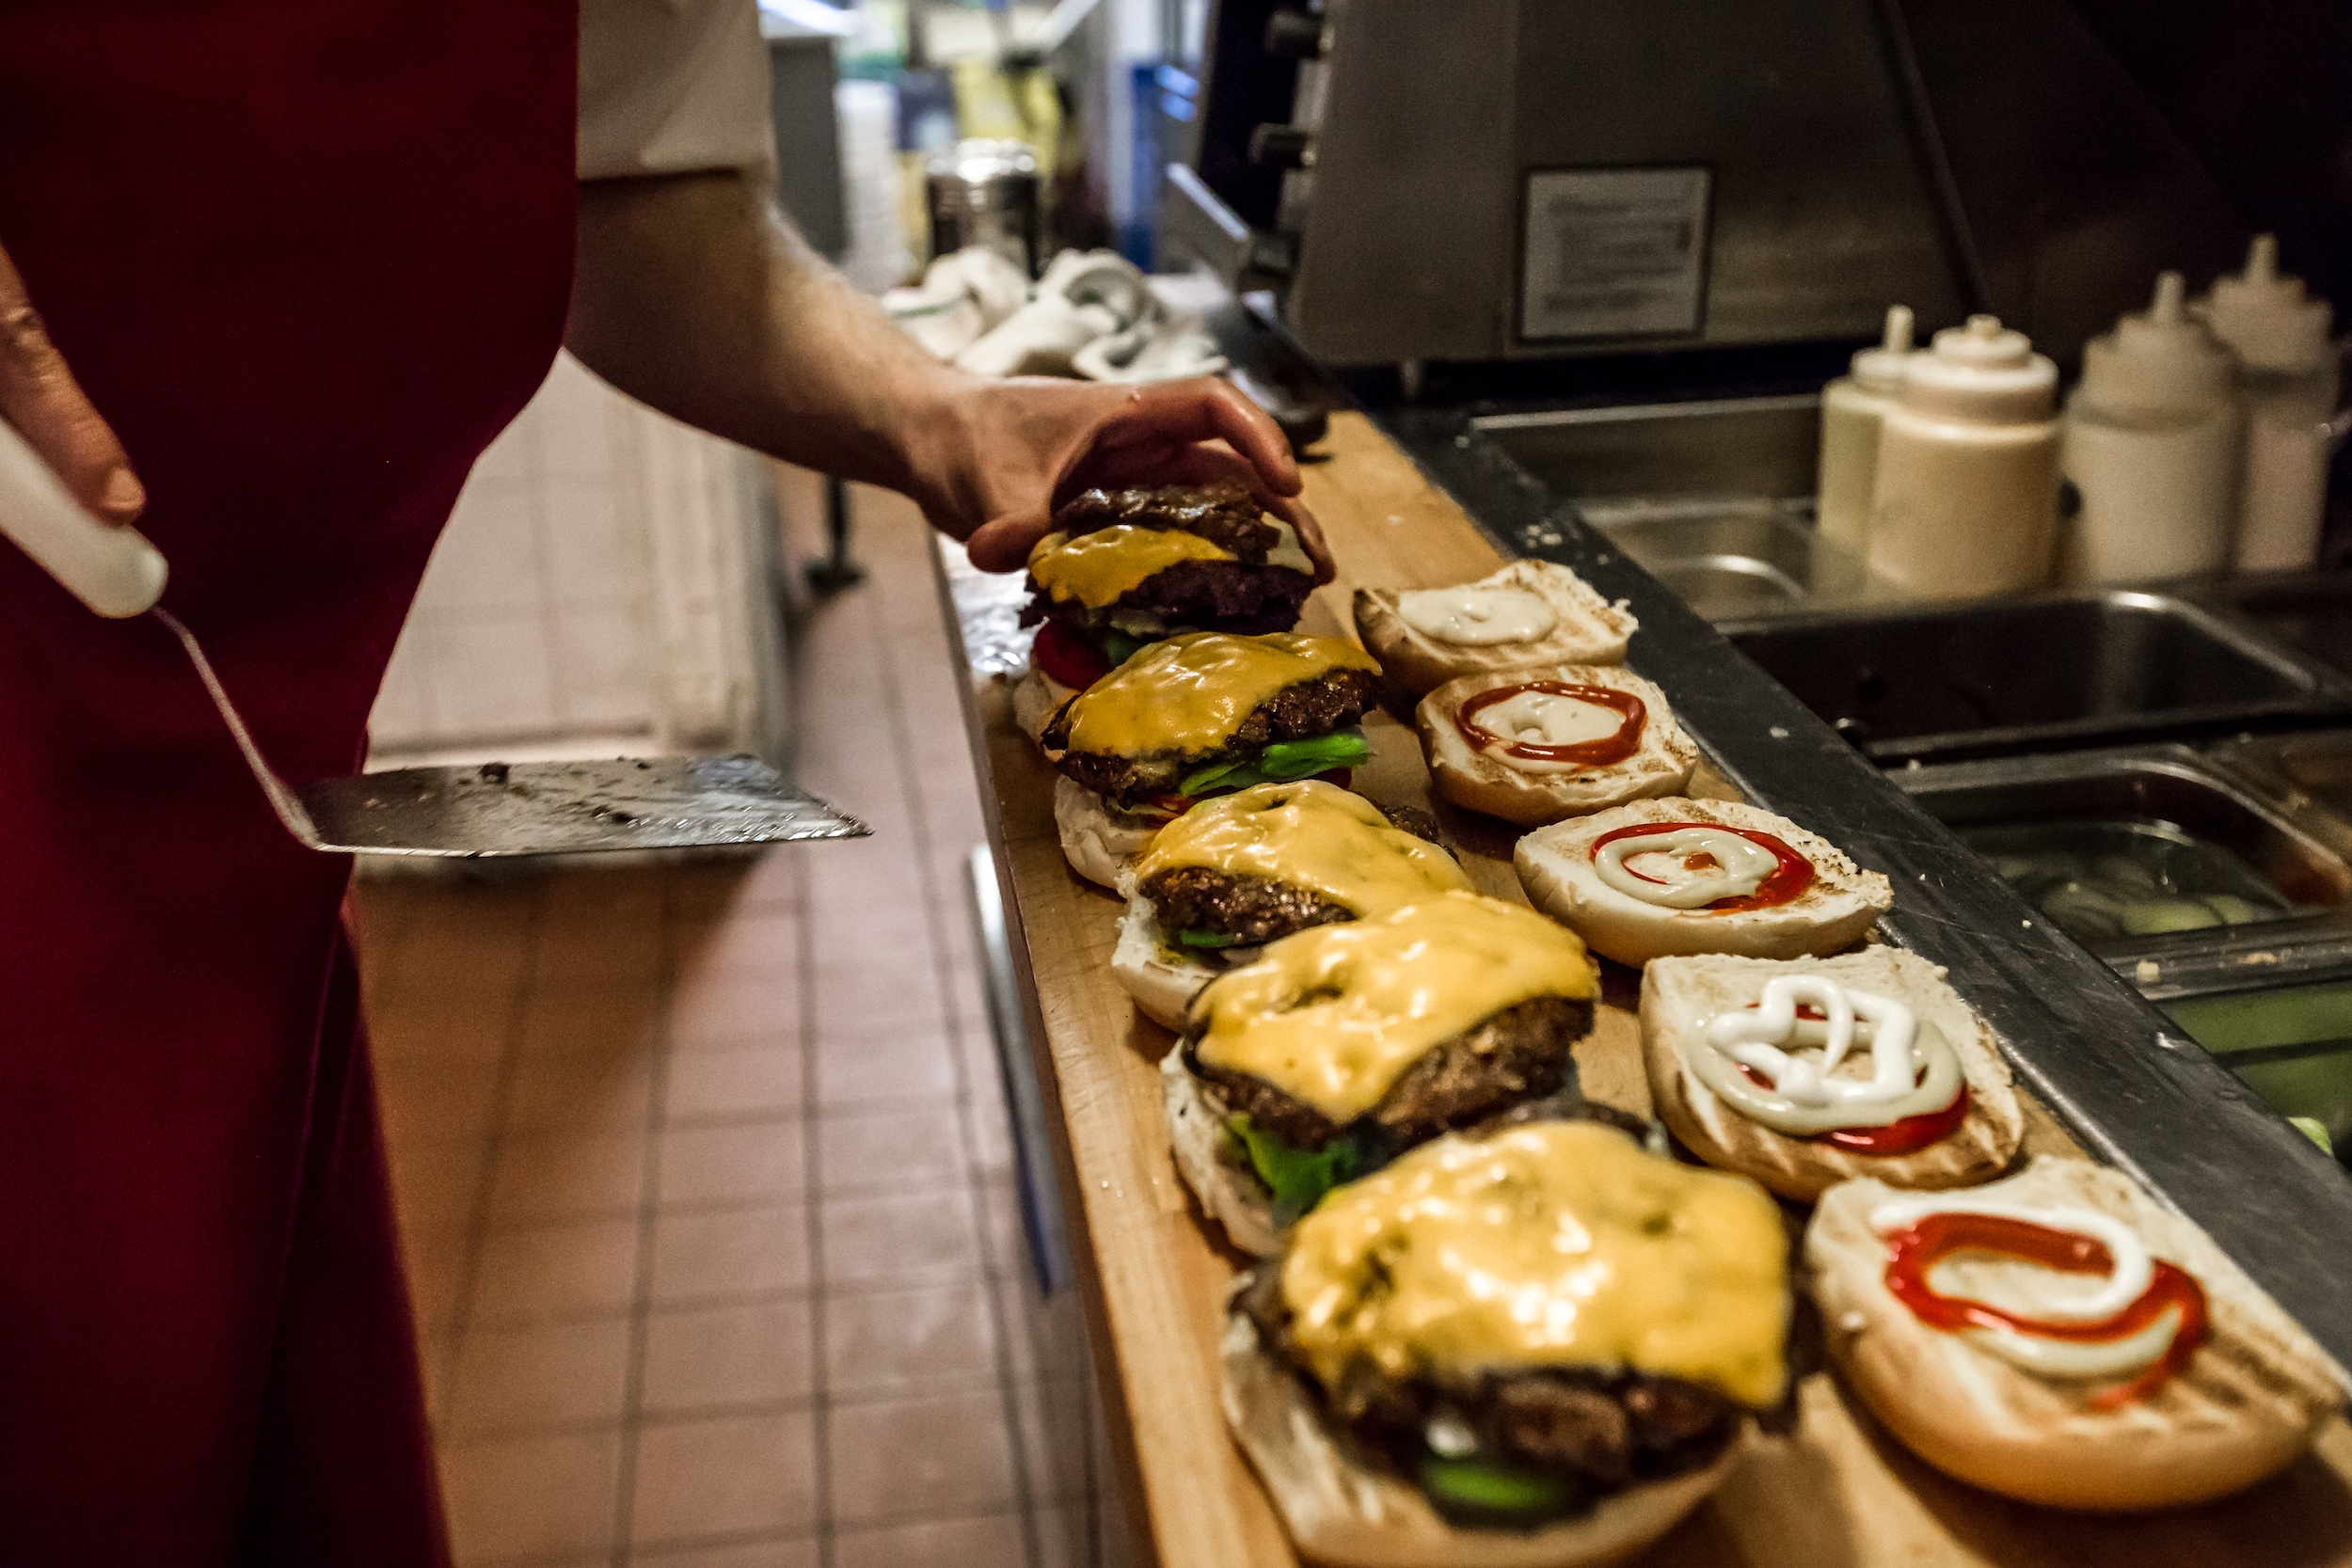 Burgers assembly line at Uniburger